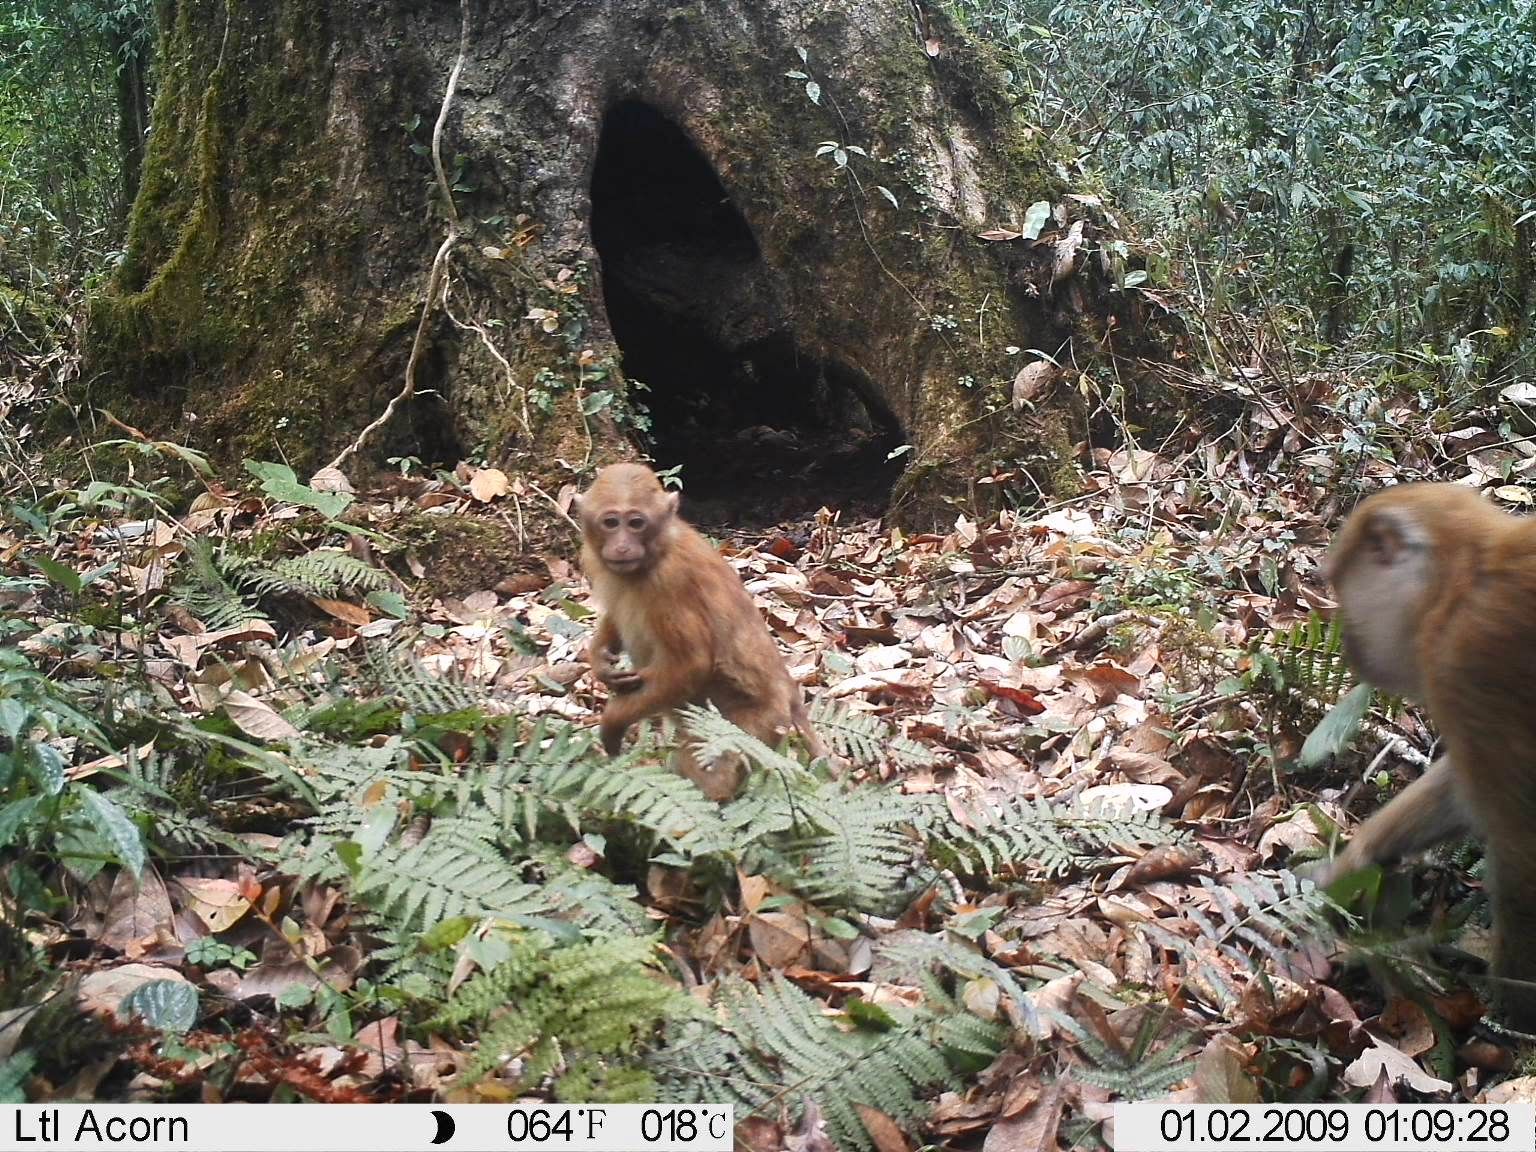 Arunachal macaque caught on camera in Eaglenest Wildlife Sanctuary, India